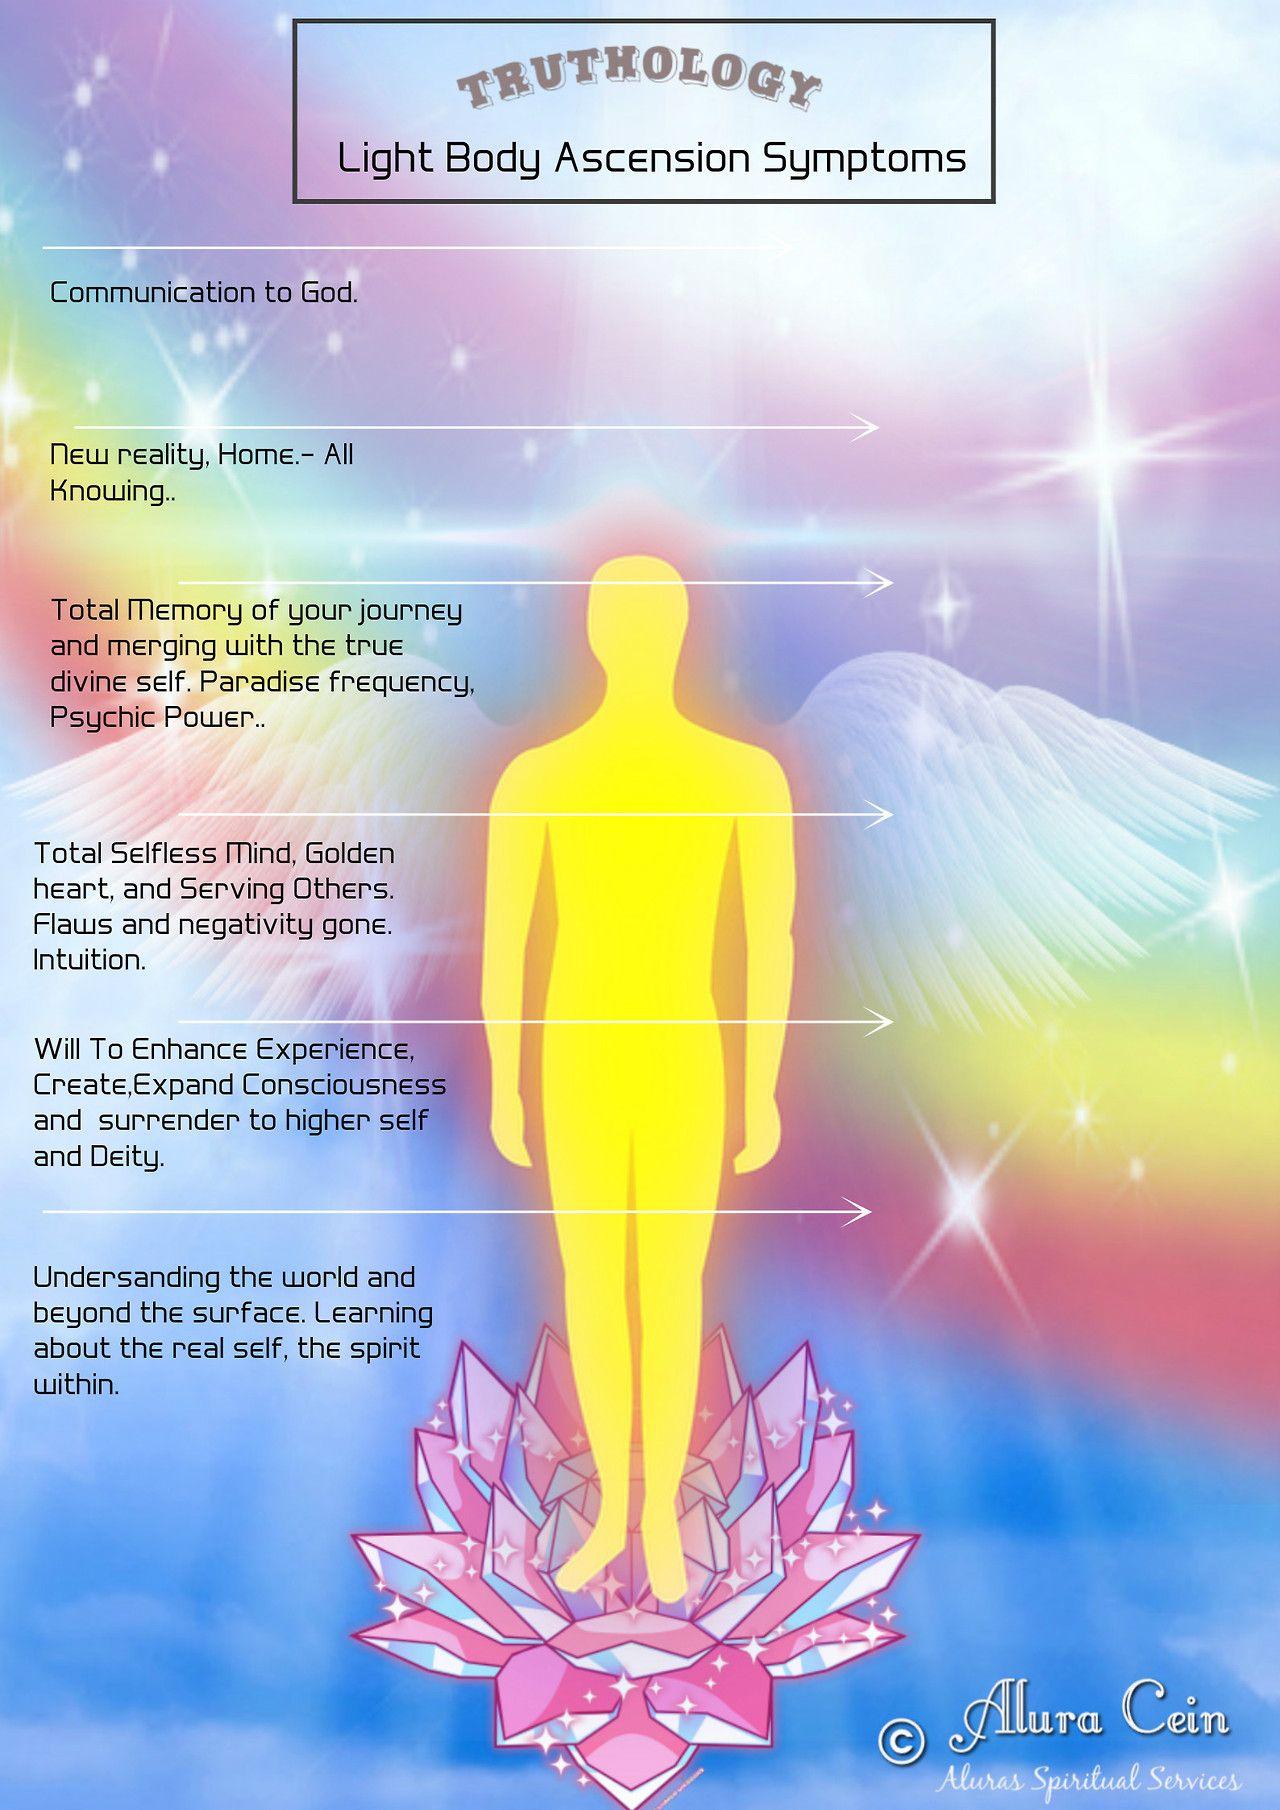 Esoteric Truthology Aluracein Awakening2017 Light Body Ascension Stages Into Awakening Psychic Powers Ascension Symptoms Metaphysics